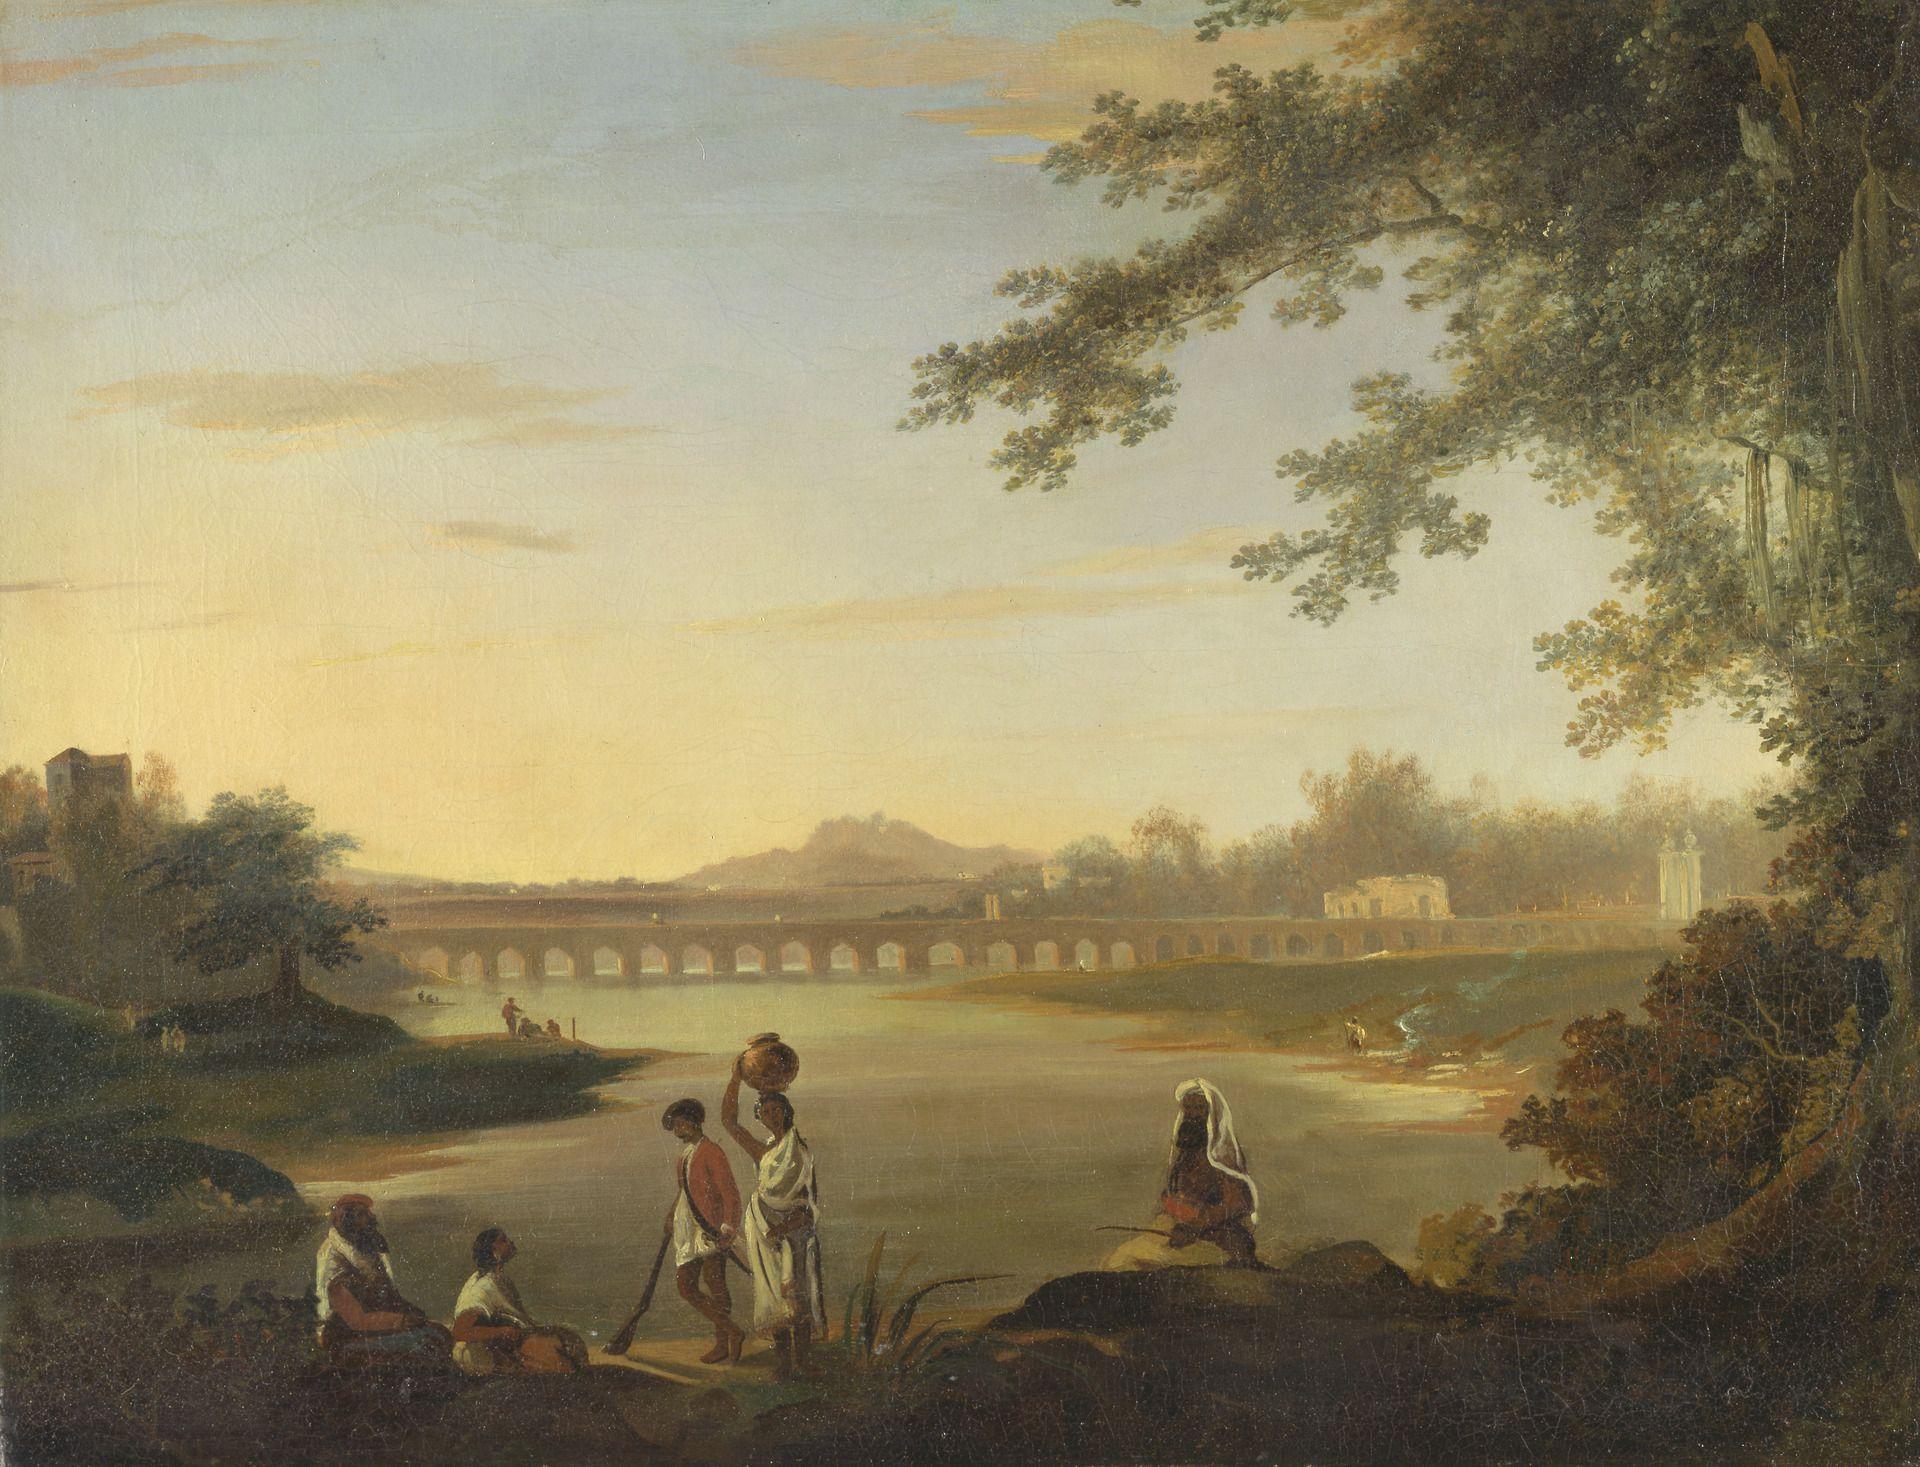 The Marmalong Bridge | William Hodges | Oil Painting